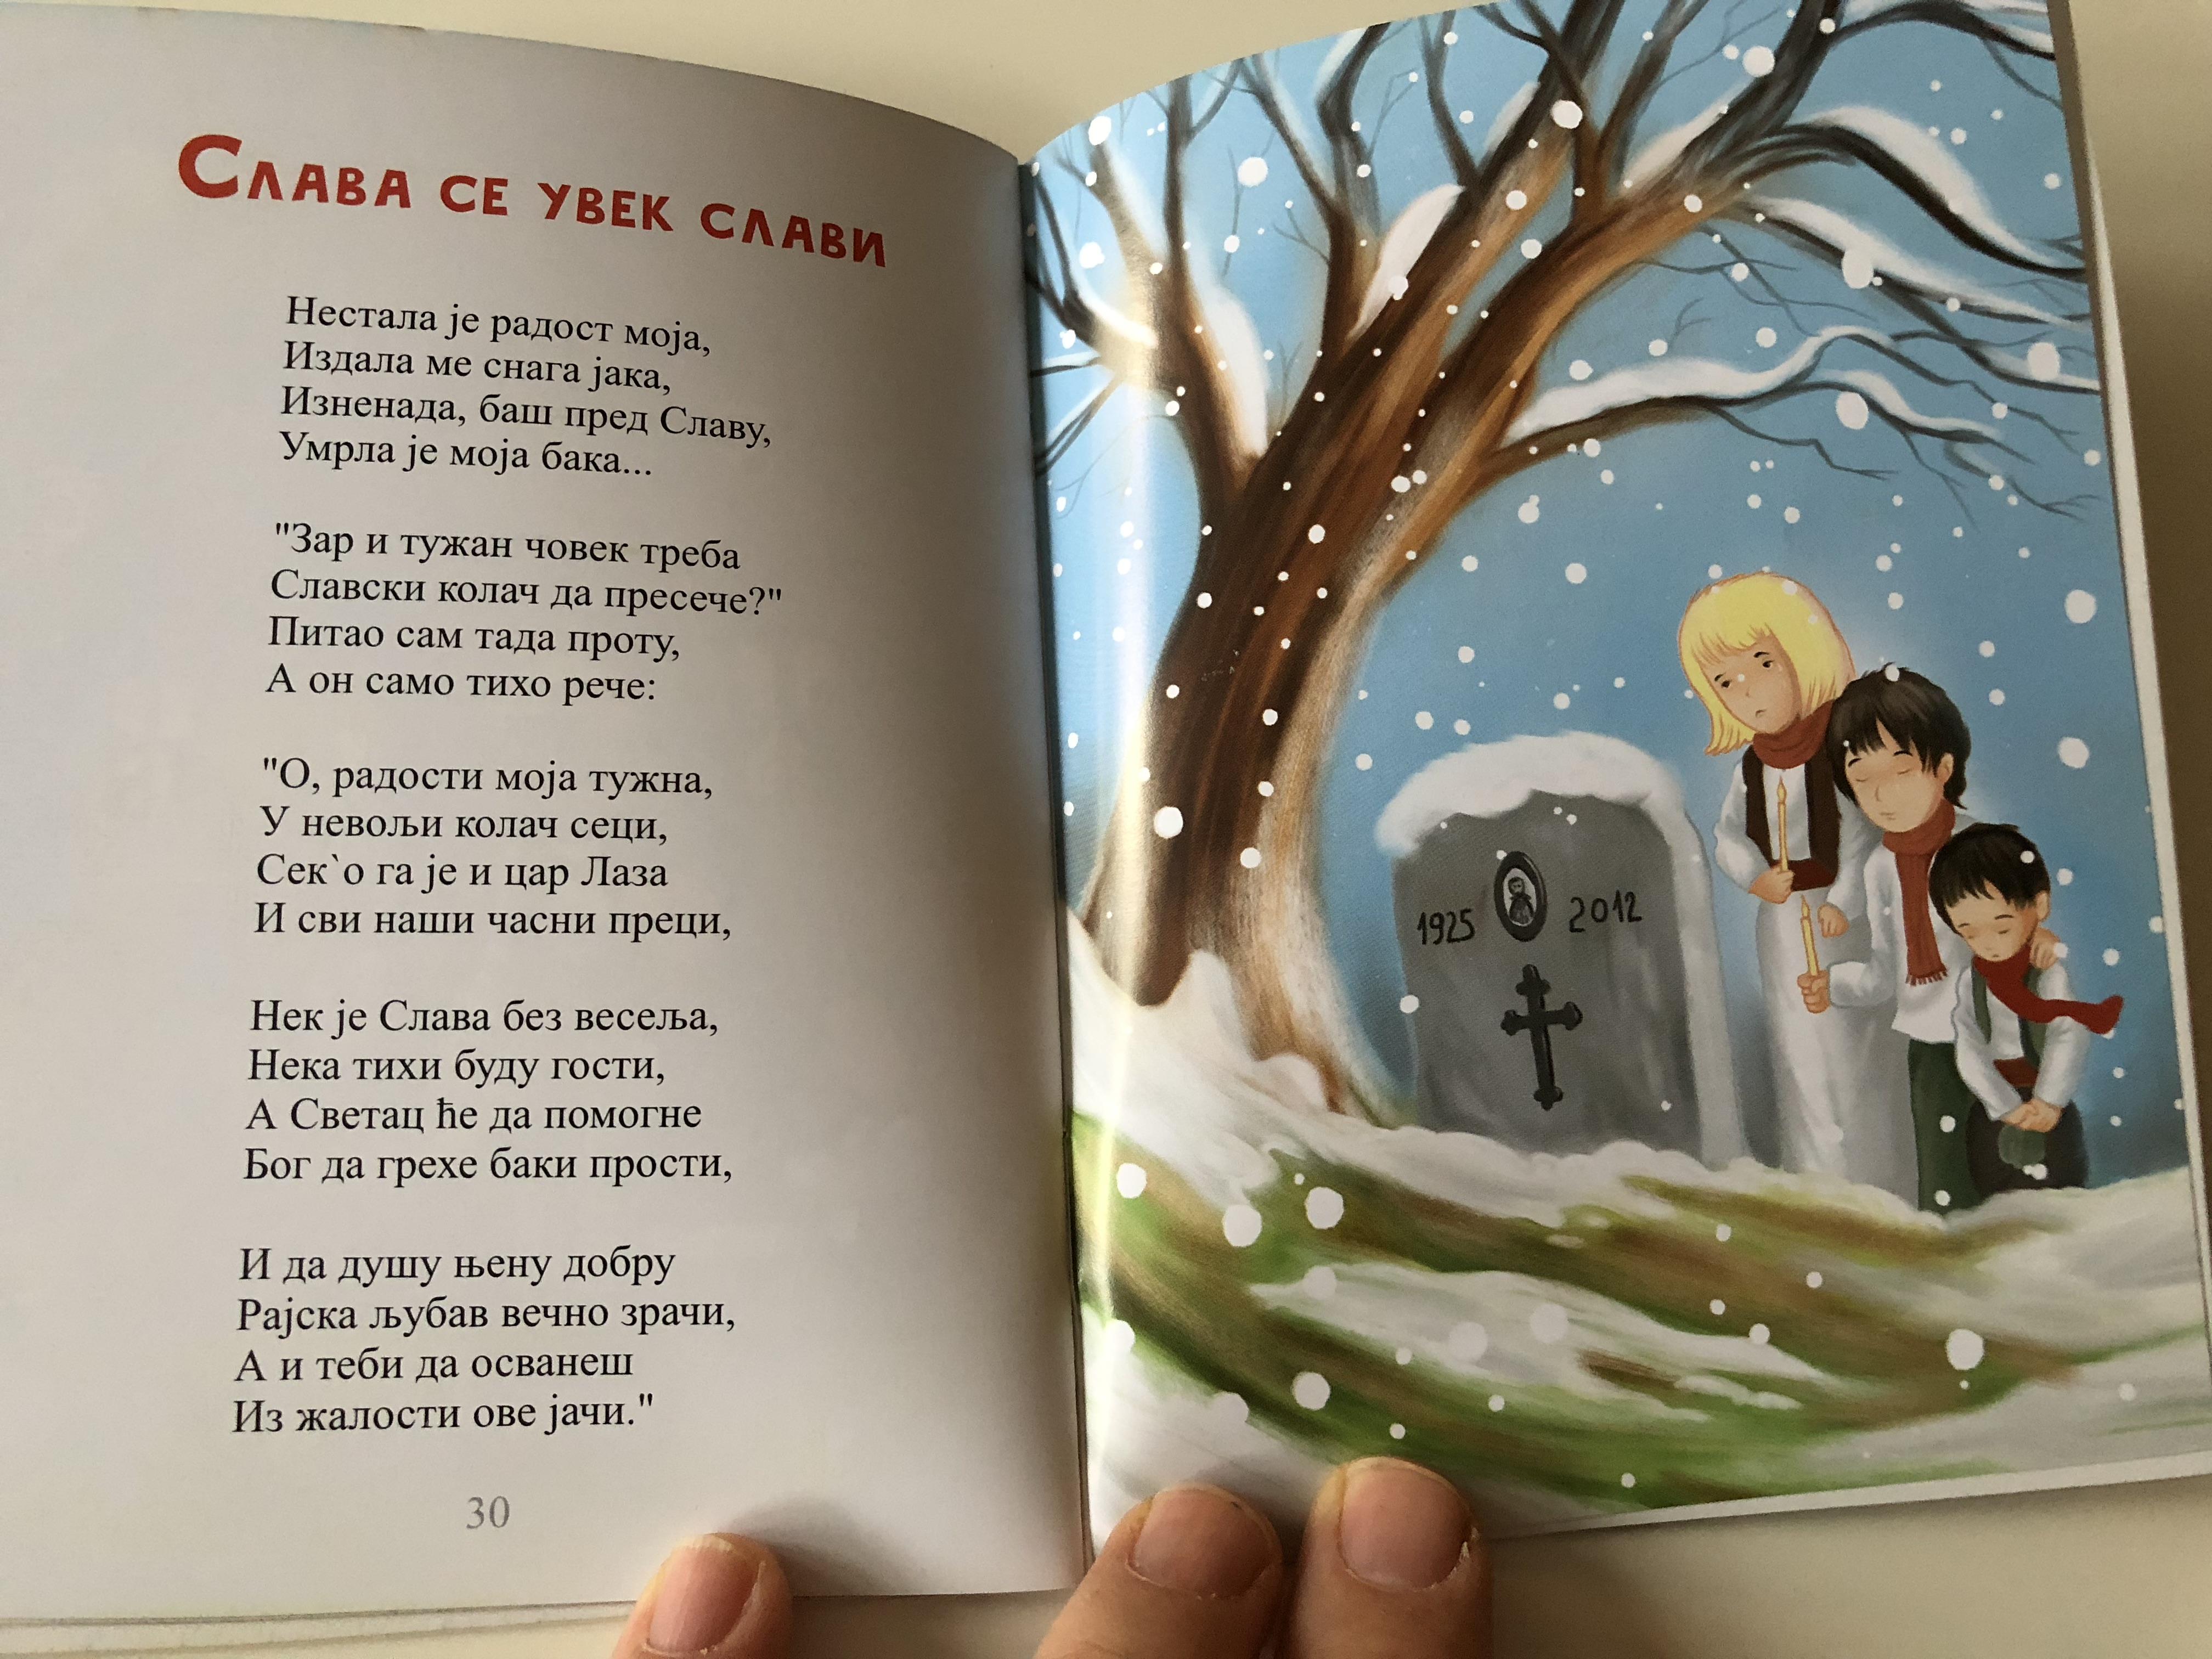 serbian-childrens-poems-orthodox-feasts-8-.jpg